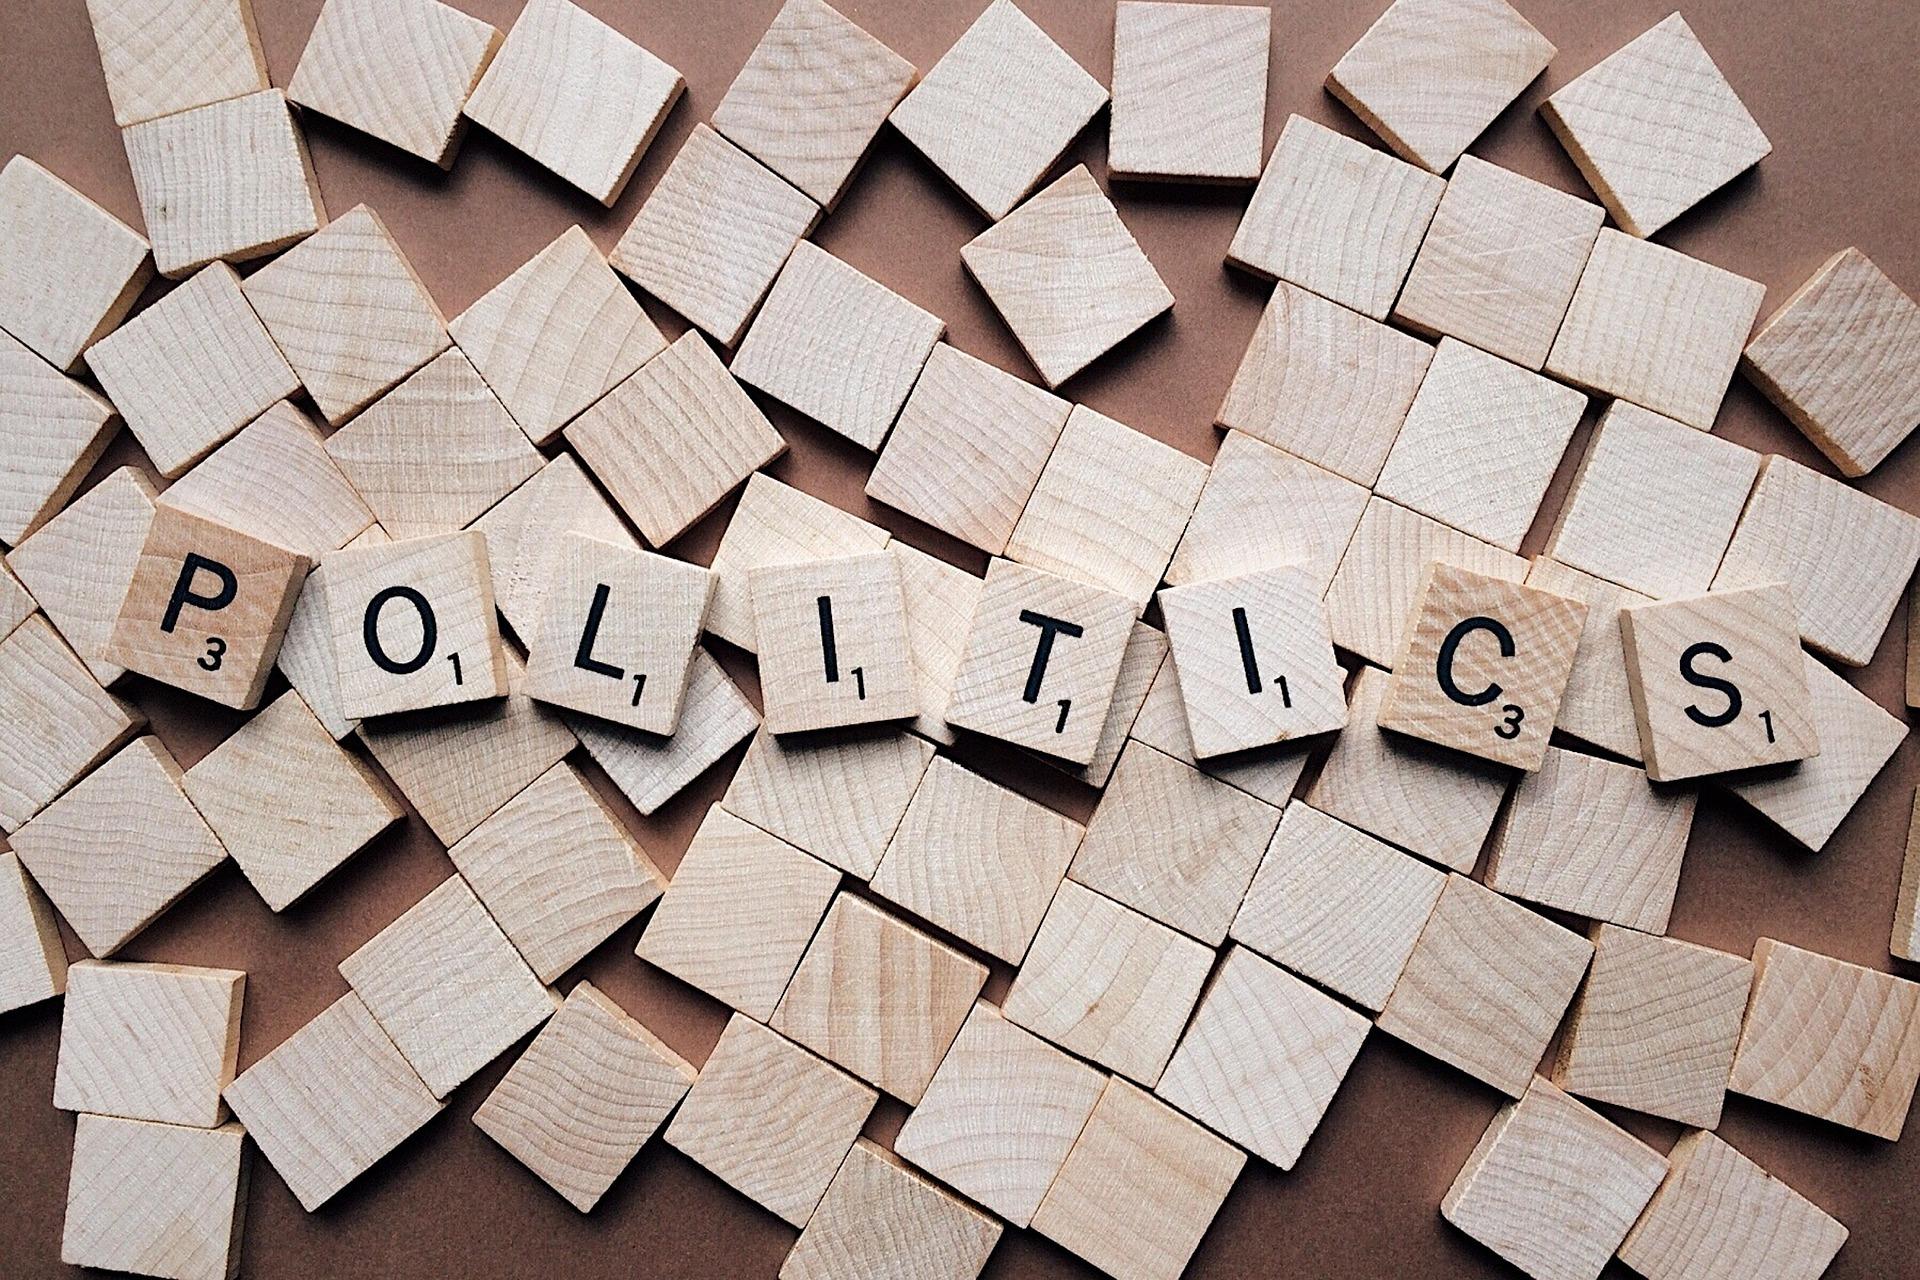 Handling Political Conversations